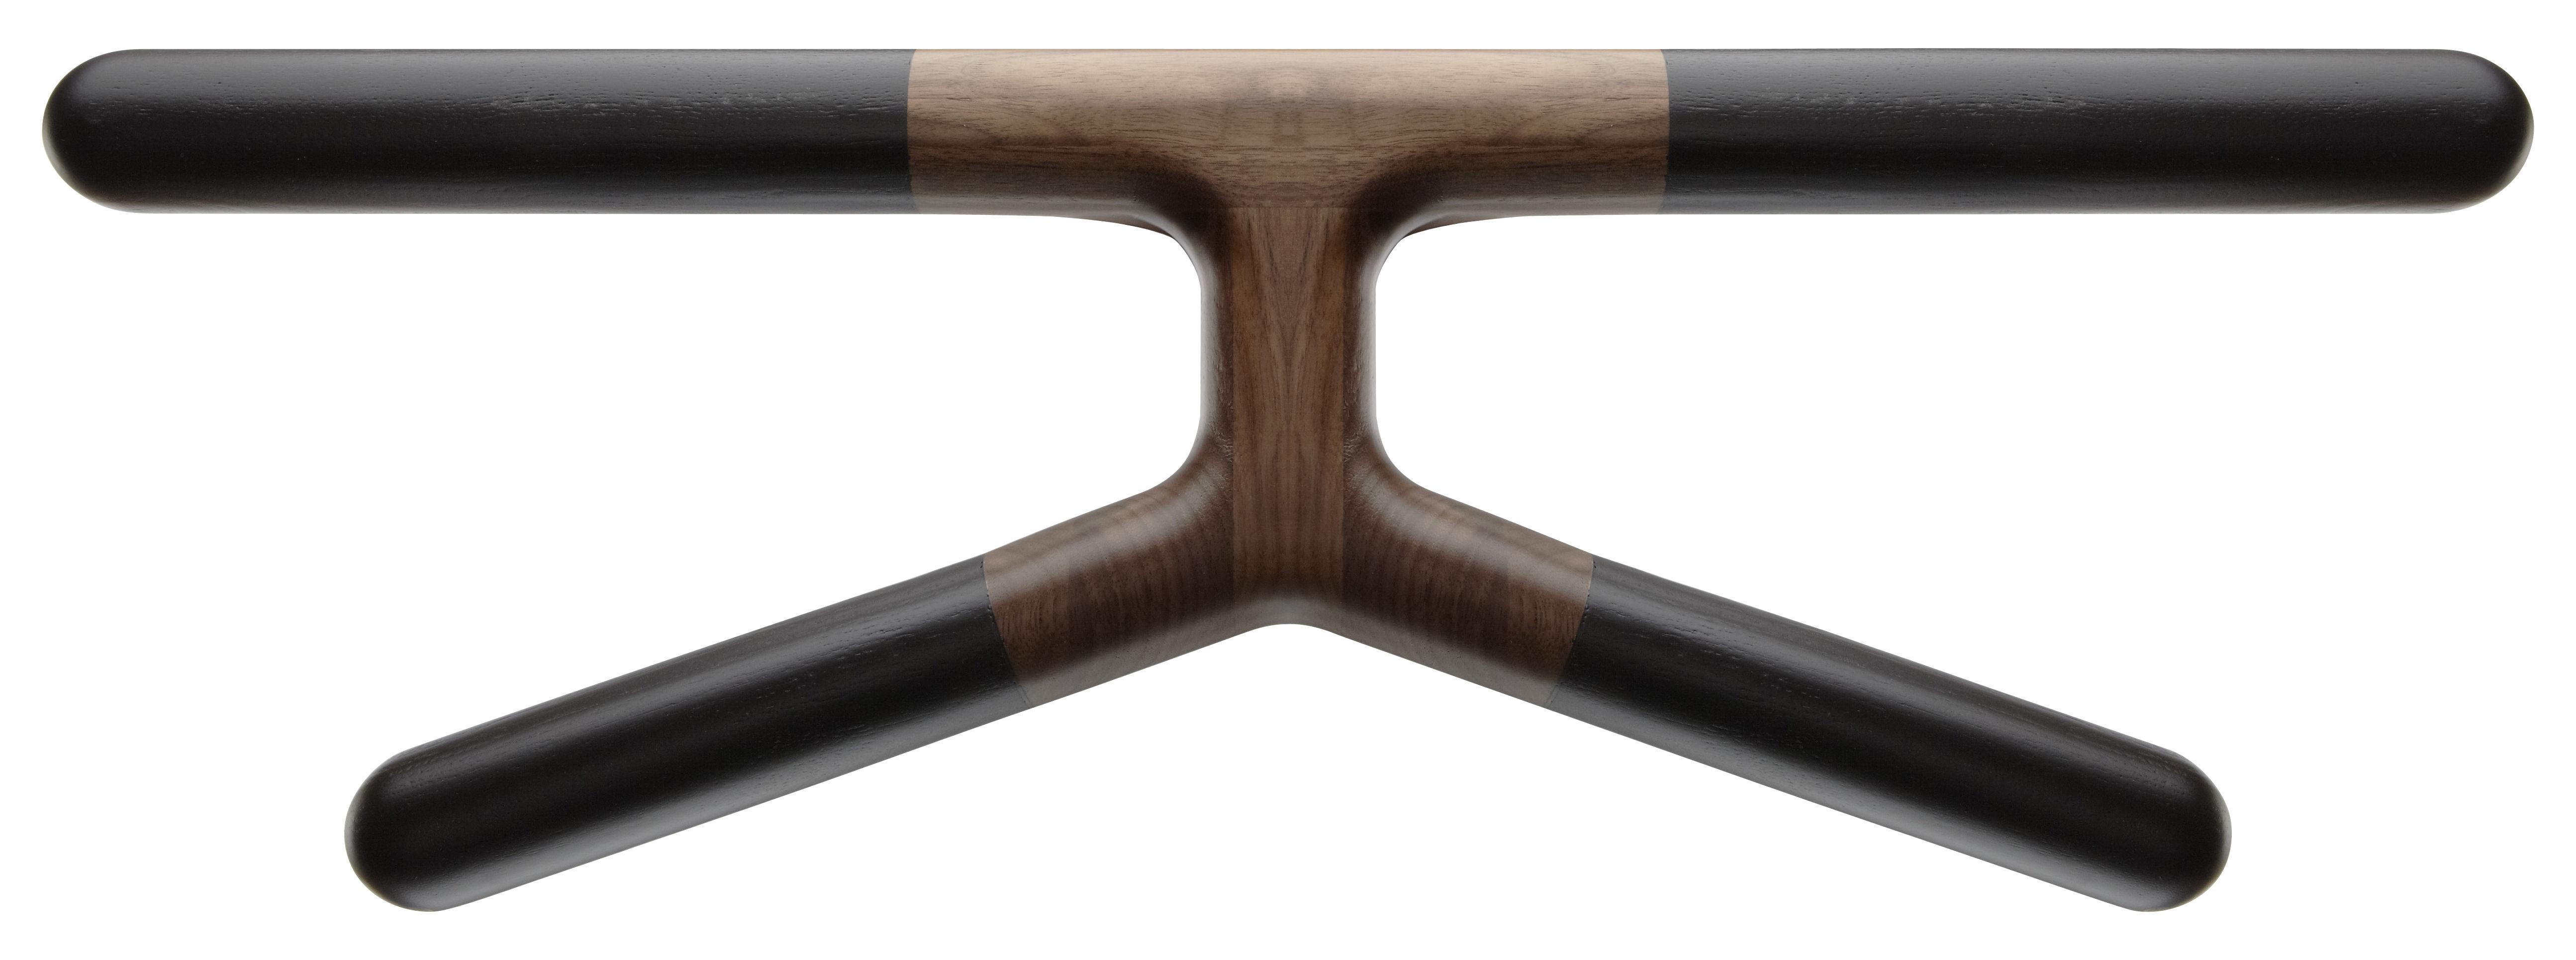 jeeves garderobe l 62 cm wandbefestigung la chance stummer diener. Black Bedroom Furniture Sets. Home Design Ideas